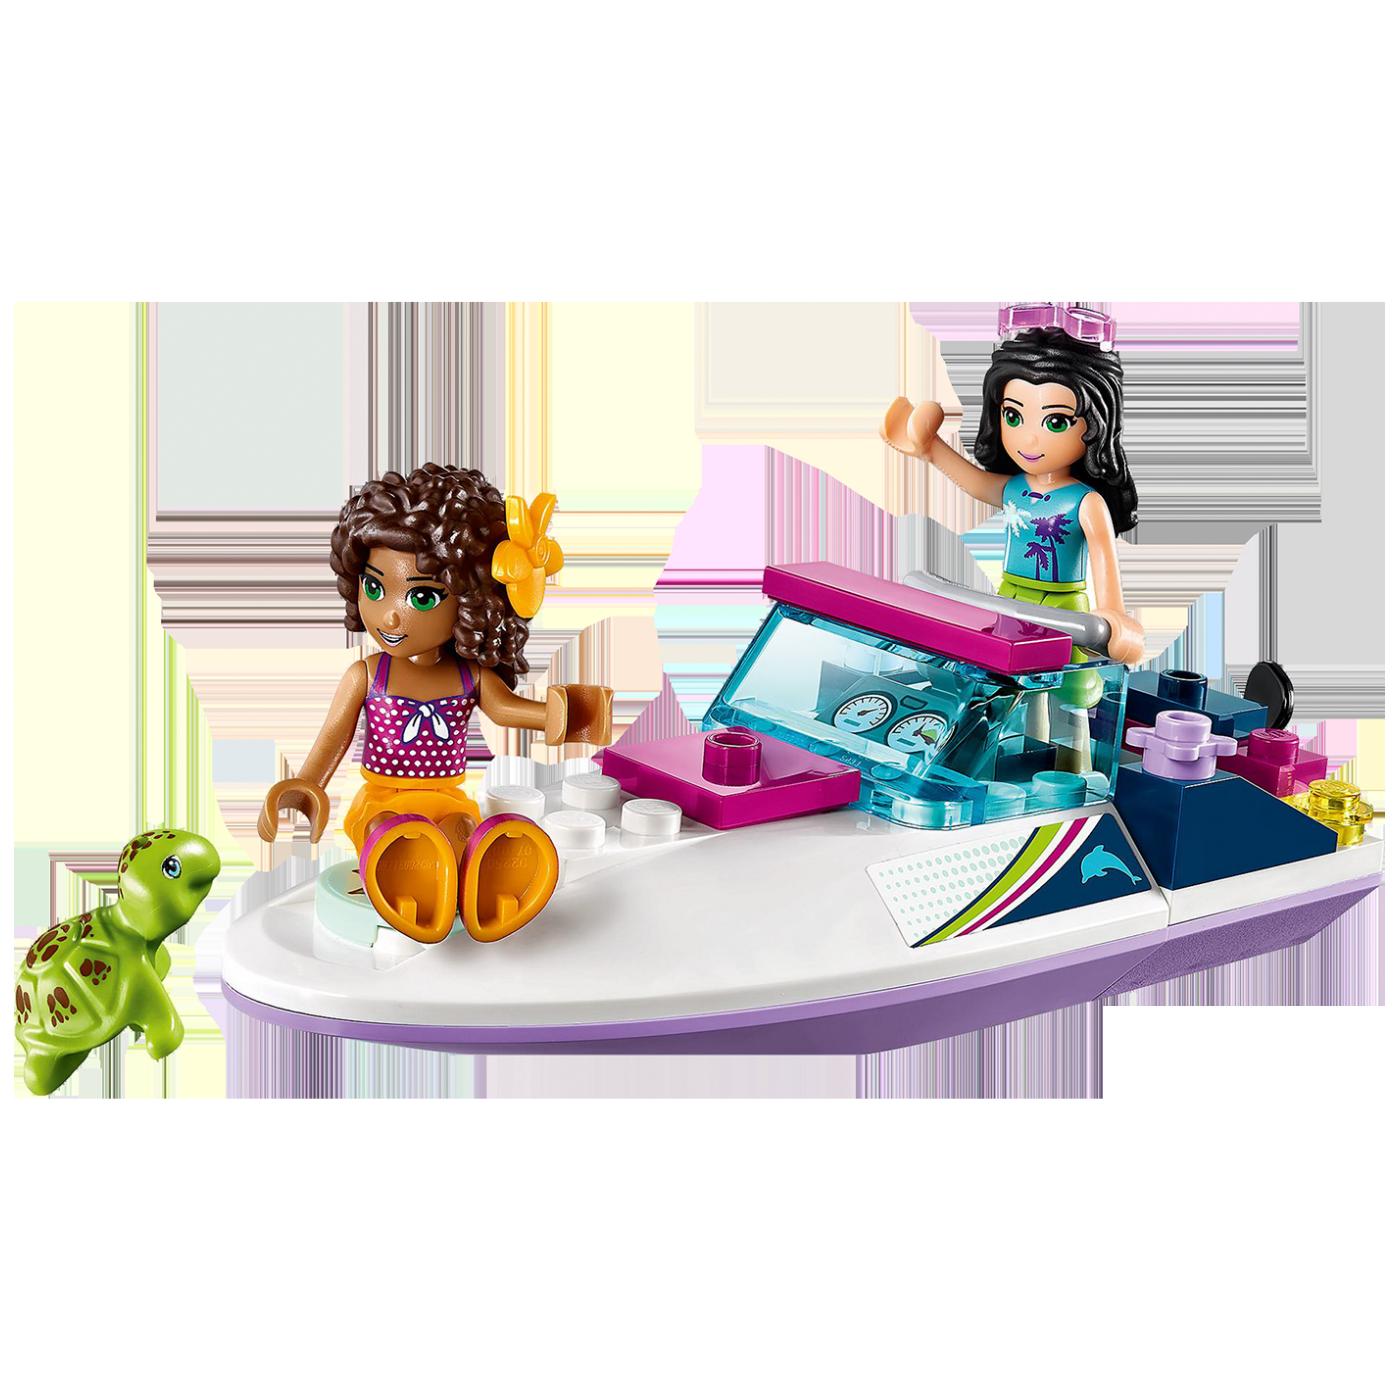 Andrein transporter glisera, LEGO Friends